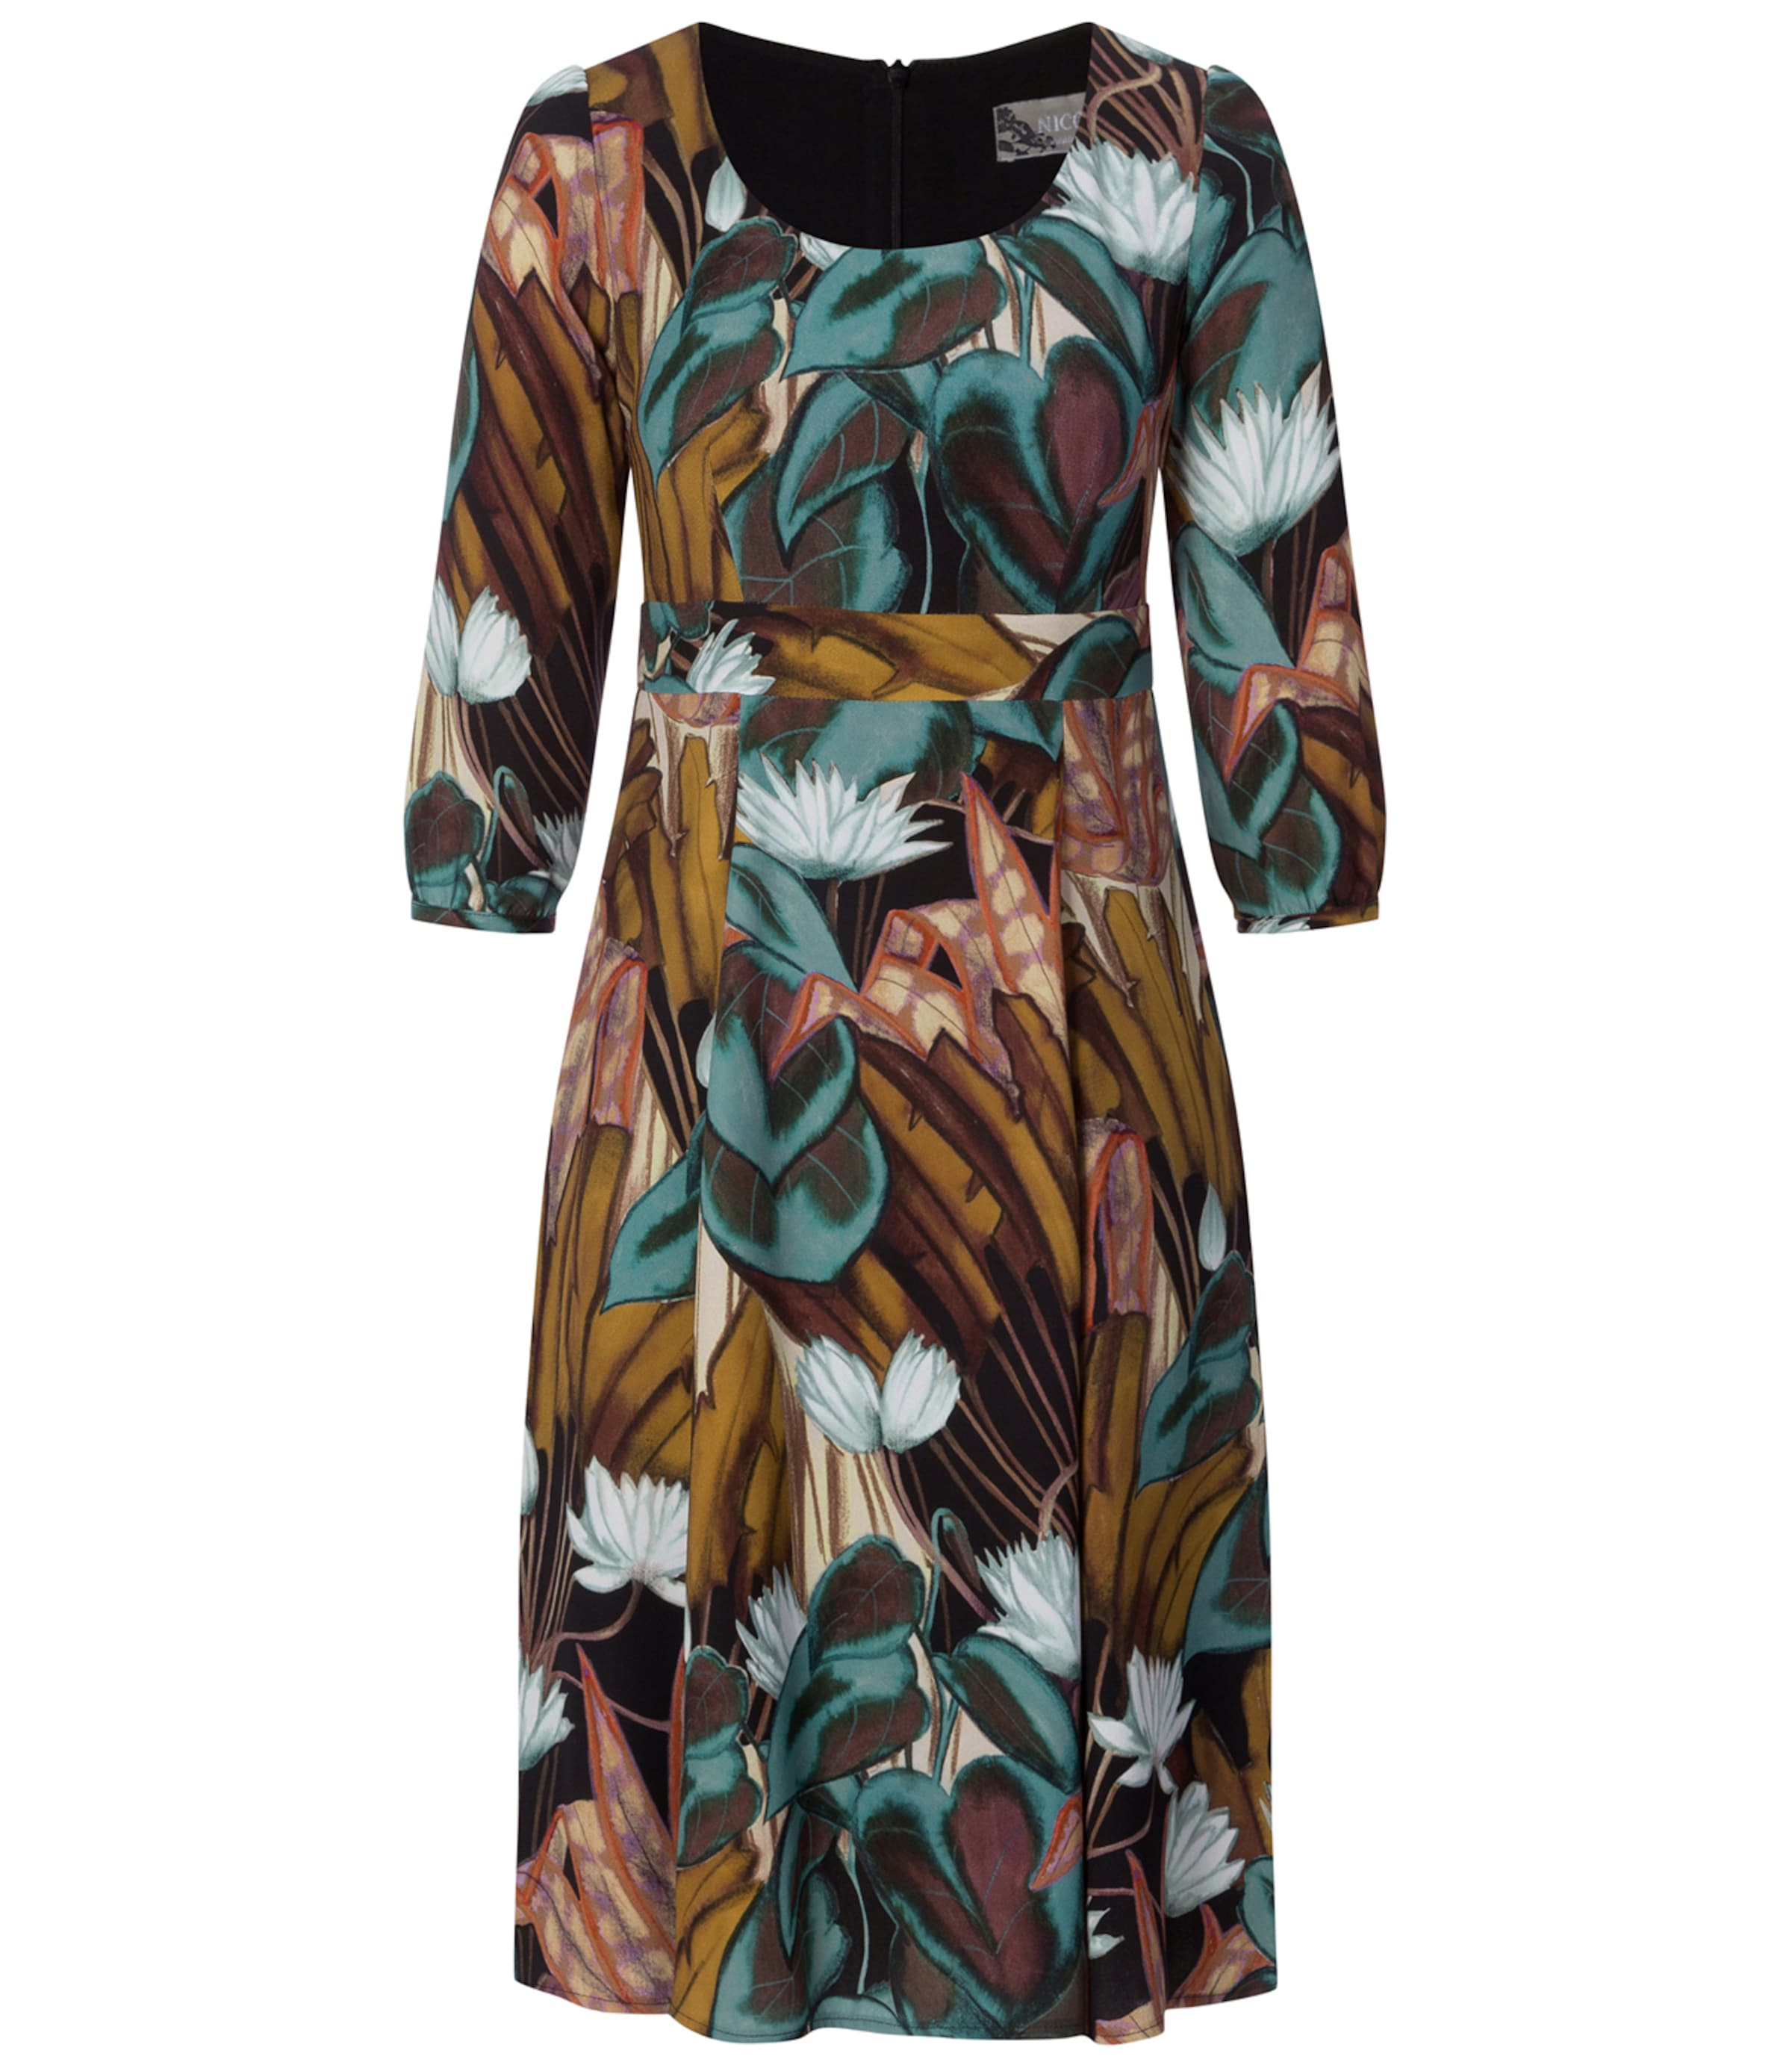 Kleid Nicowa Nicowa In MischfarbenSchwarz MischfarbenSchwarz In Nicowa Kleid 0wNm8n